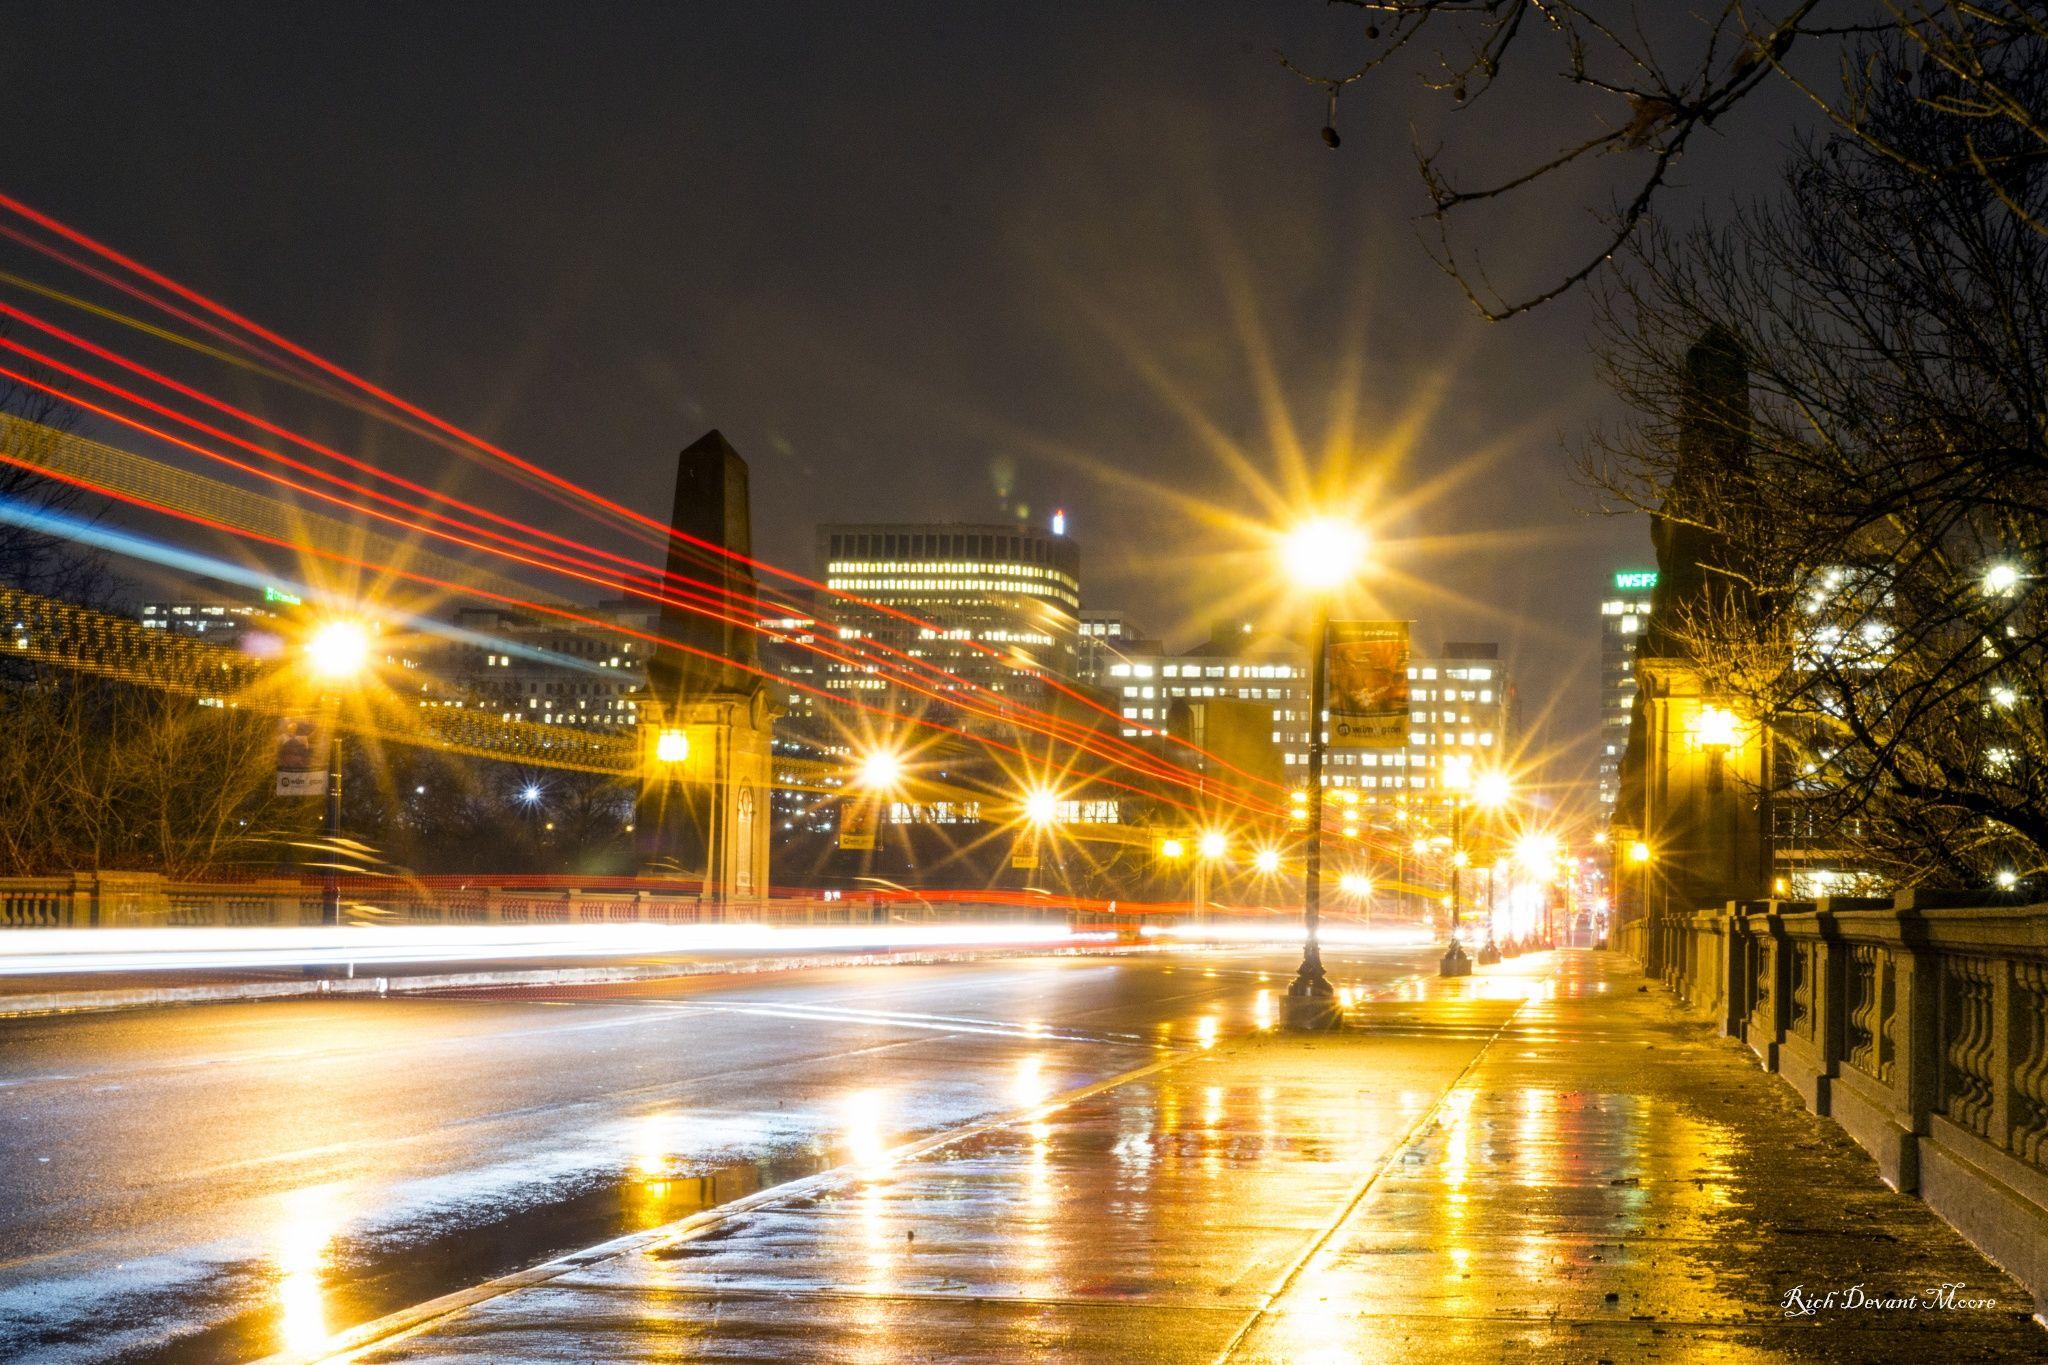 Washington Street Lights by Rich Devant Moore on 500px